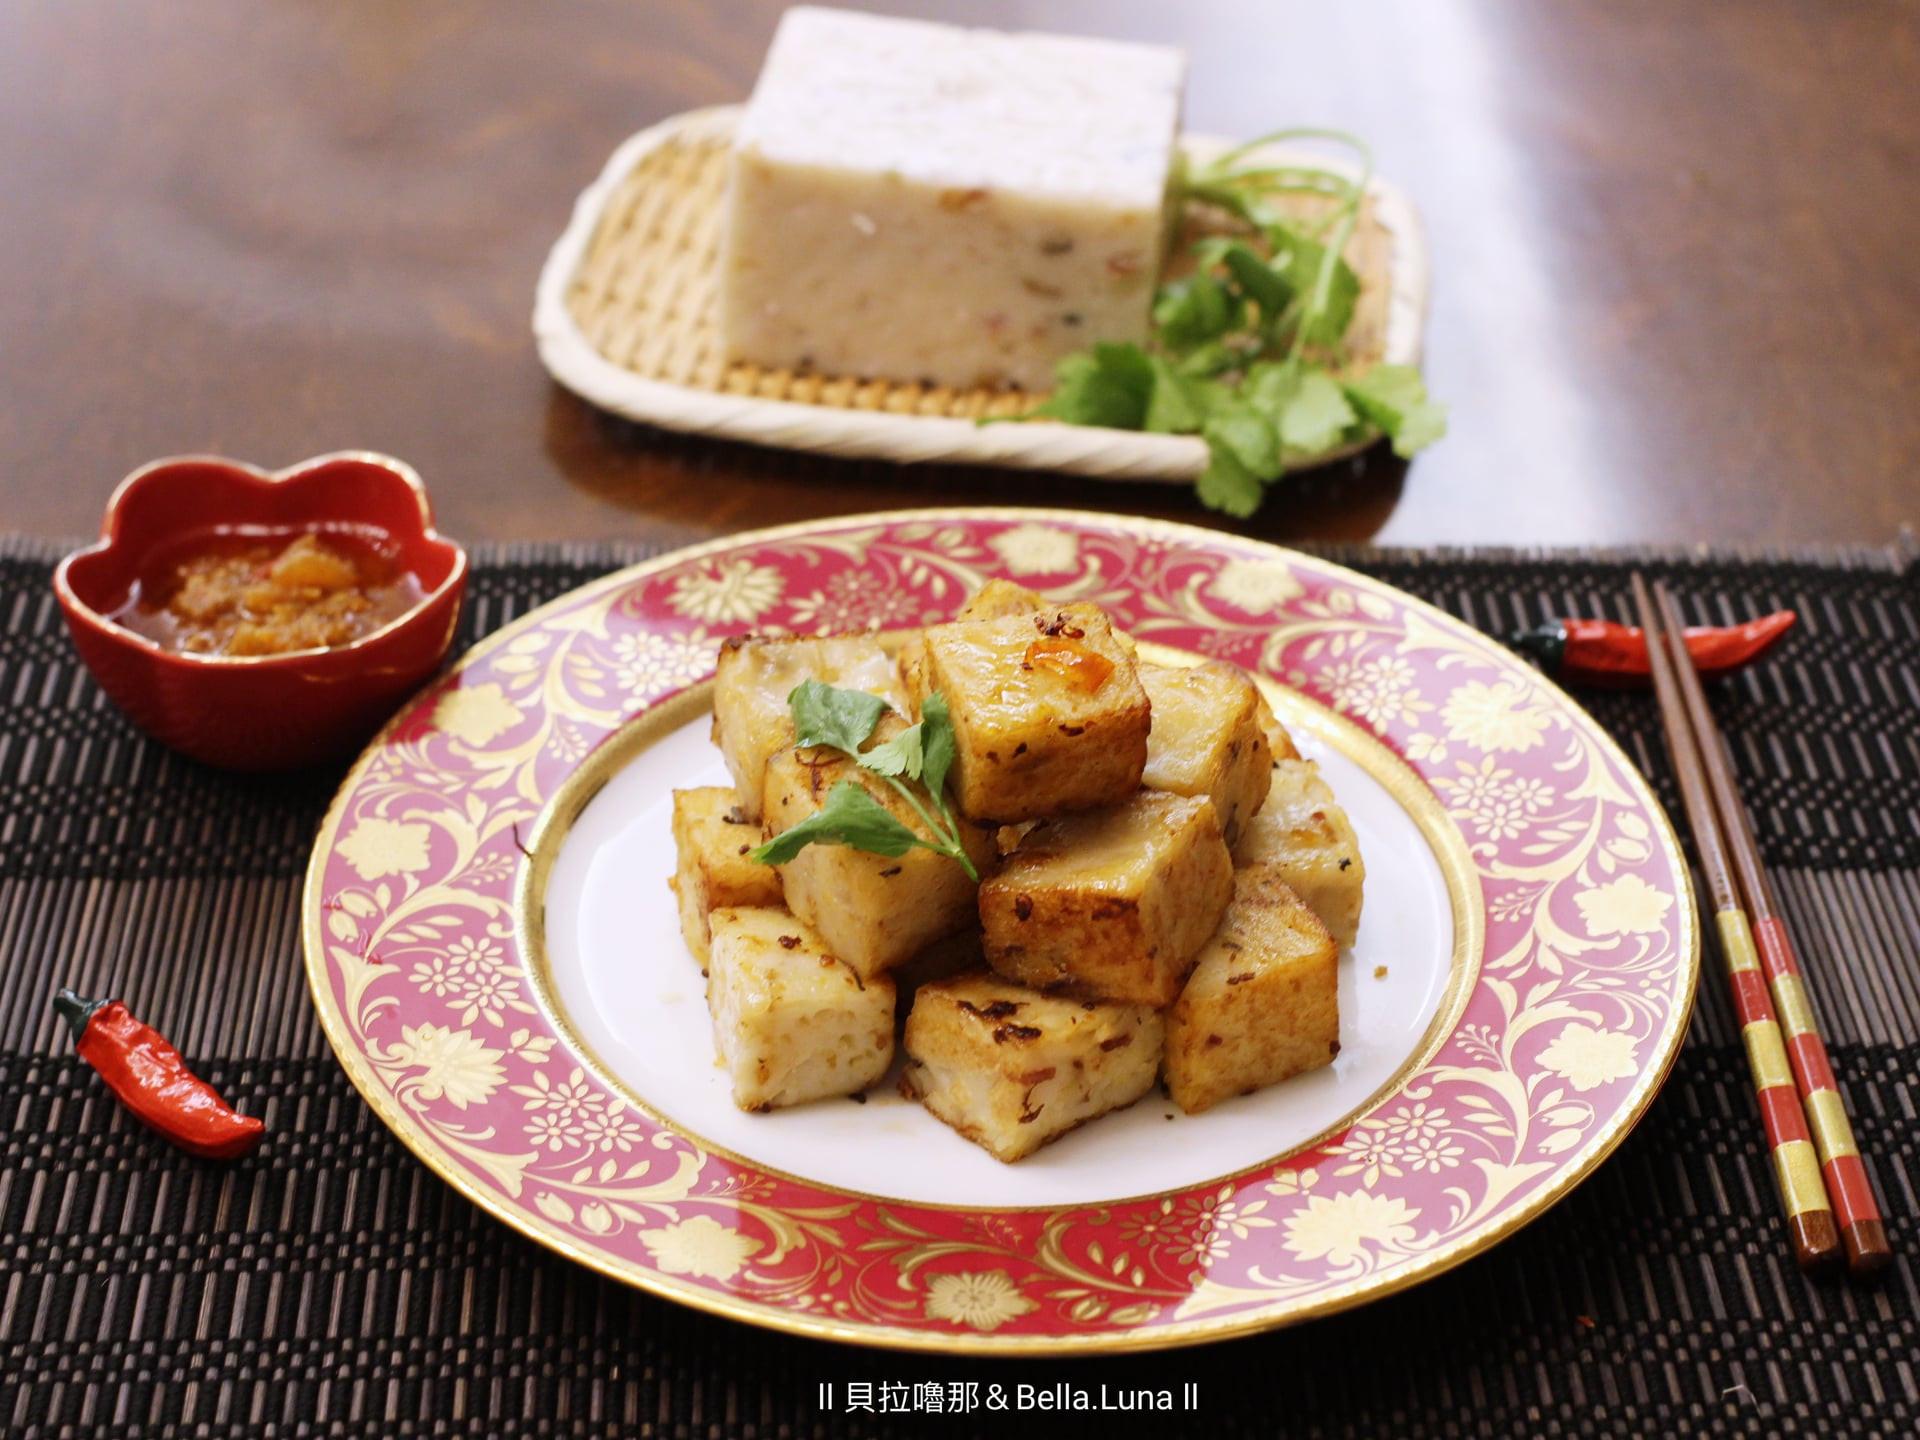 XO醬炒手工蘿蔔糕